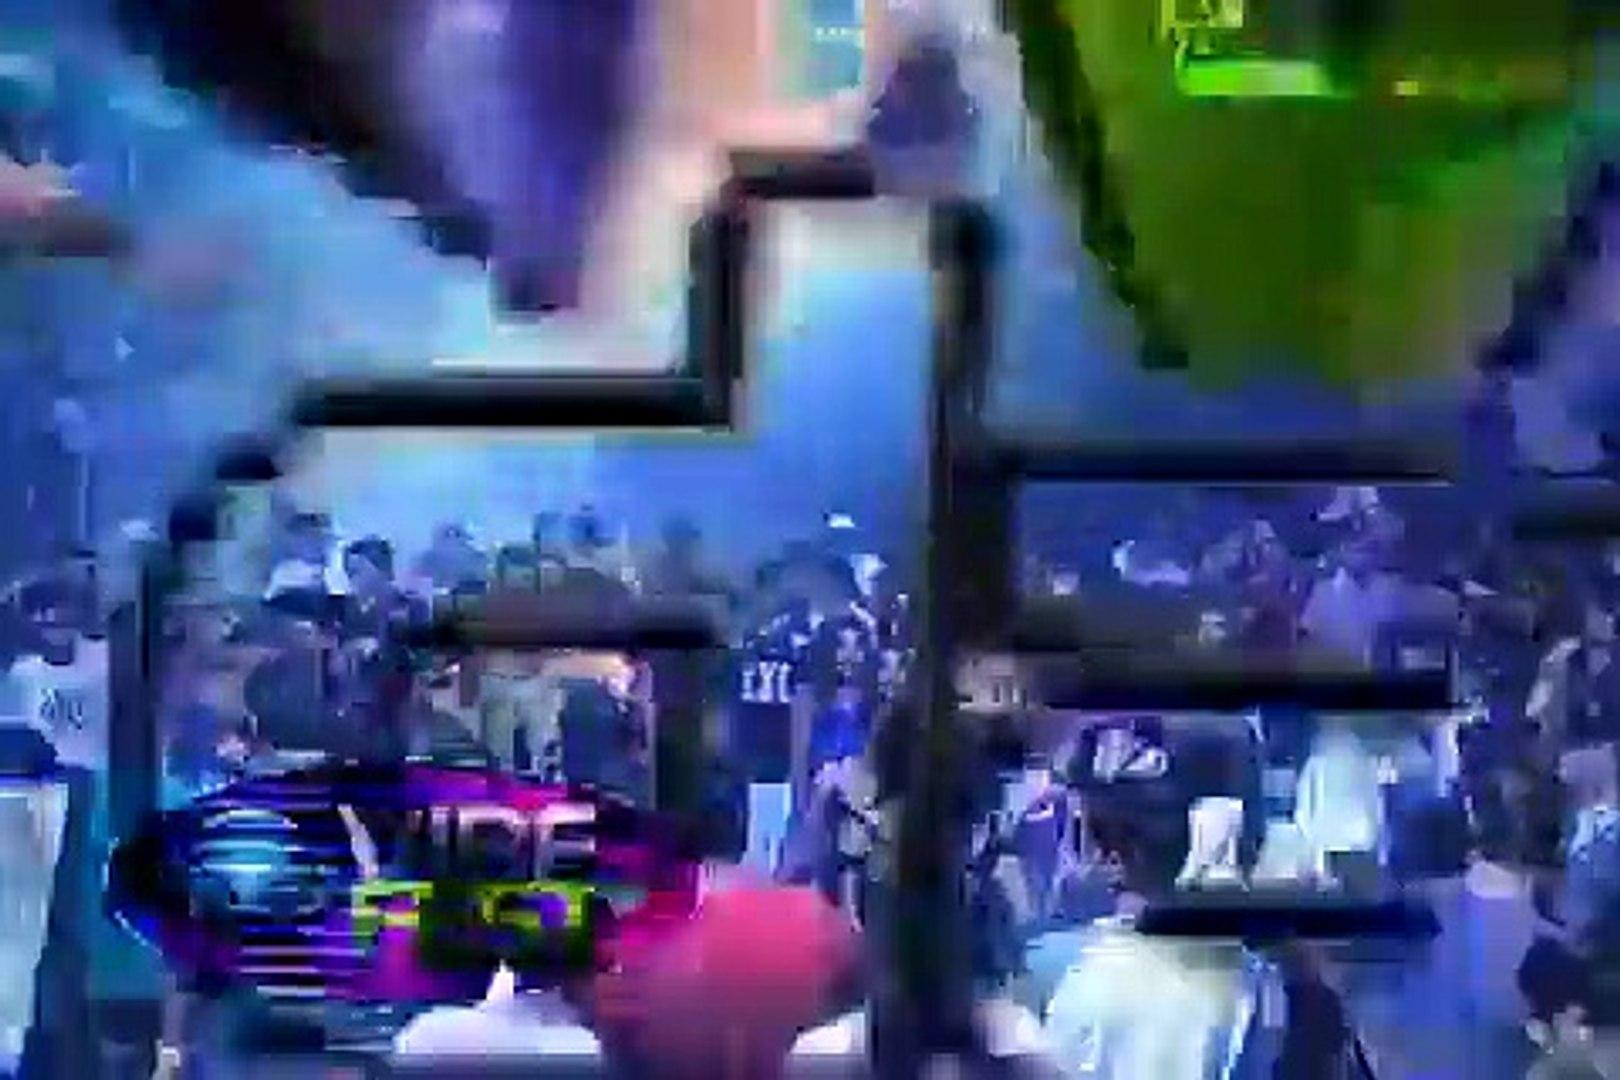 VIBE FEST - B BOYS DJ SEVERINO GUARAPUAVA FREE WAY